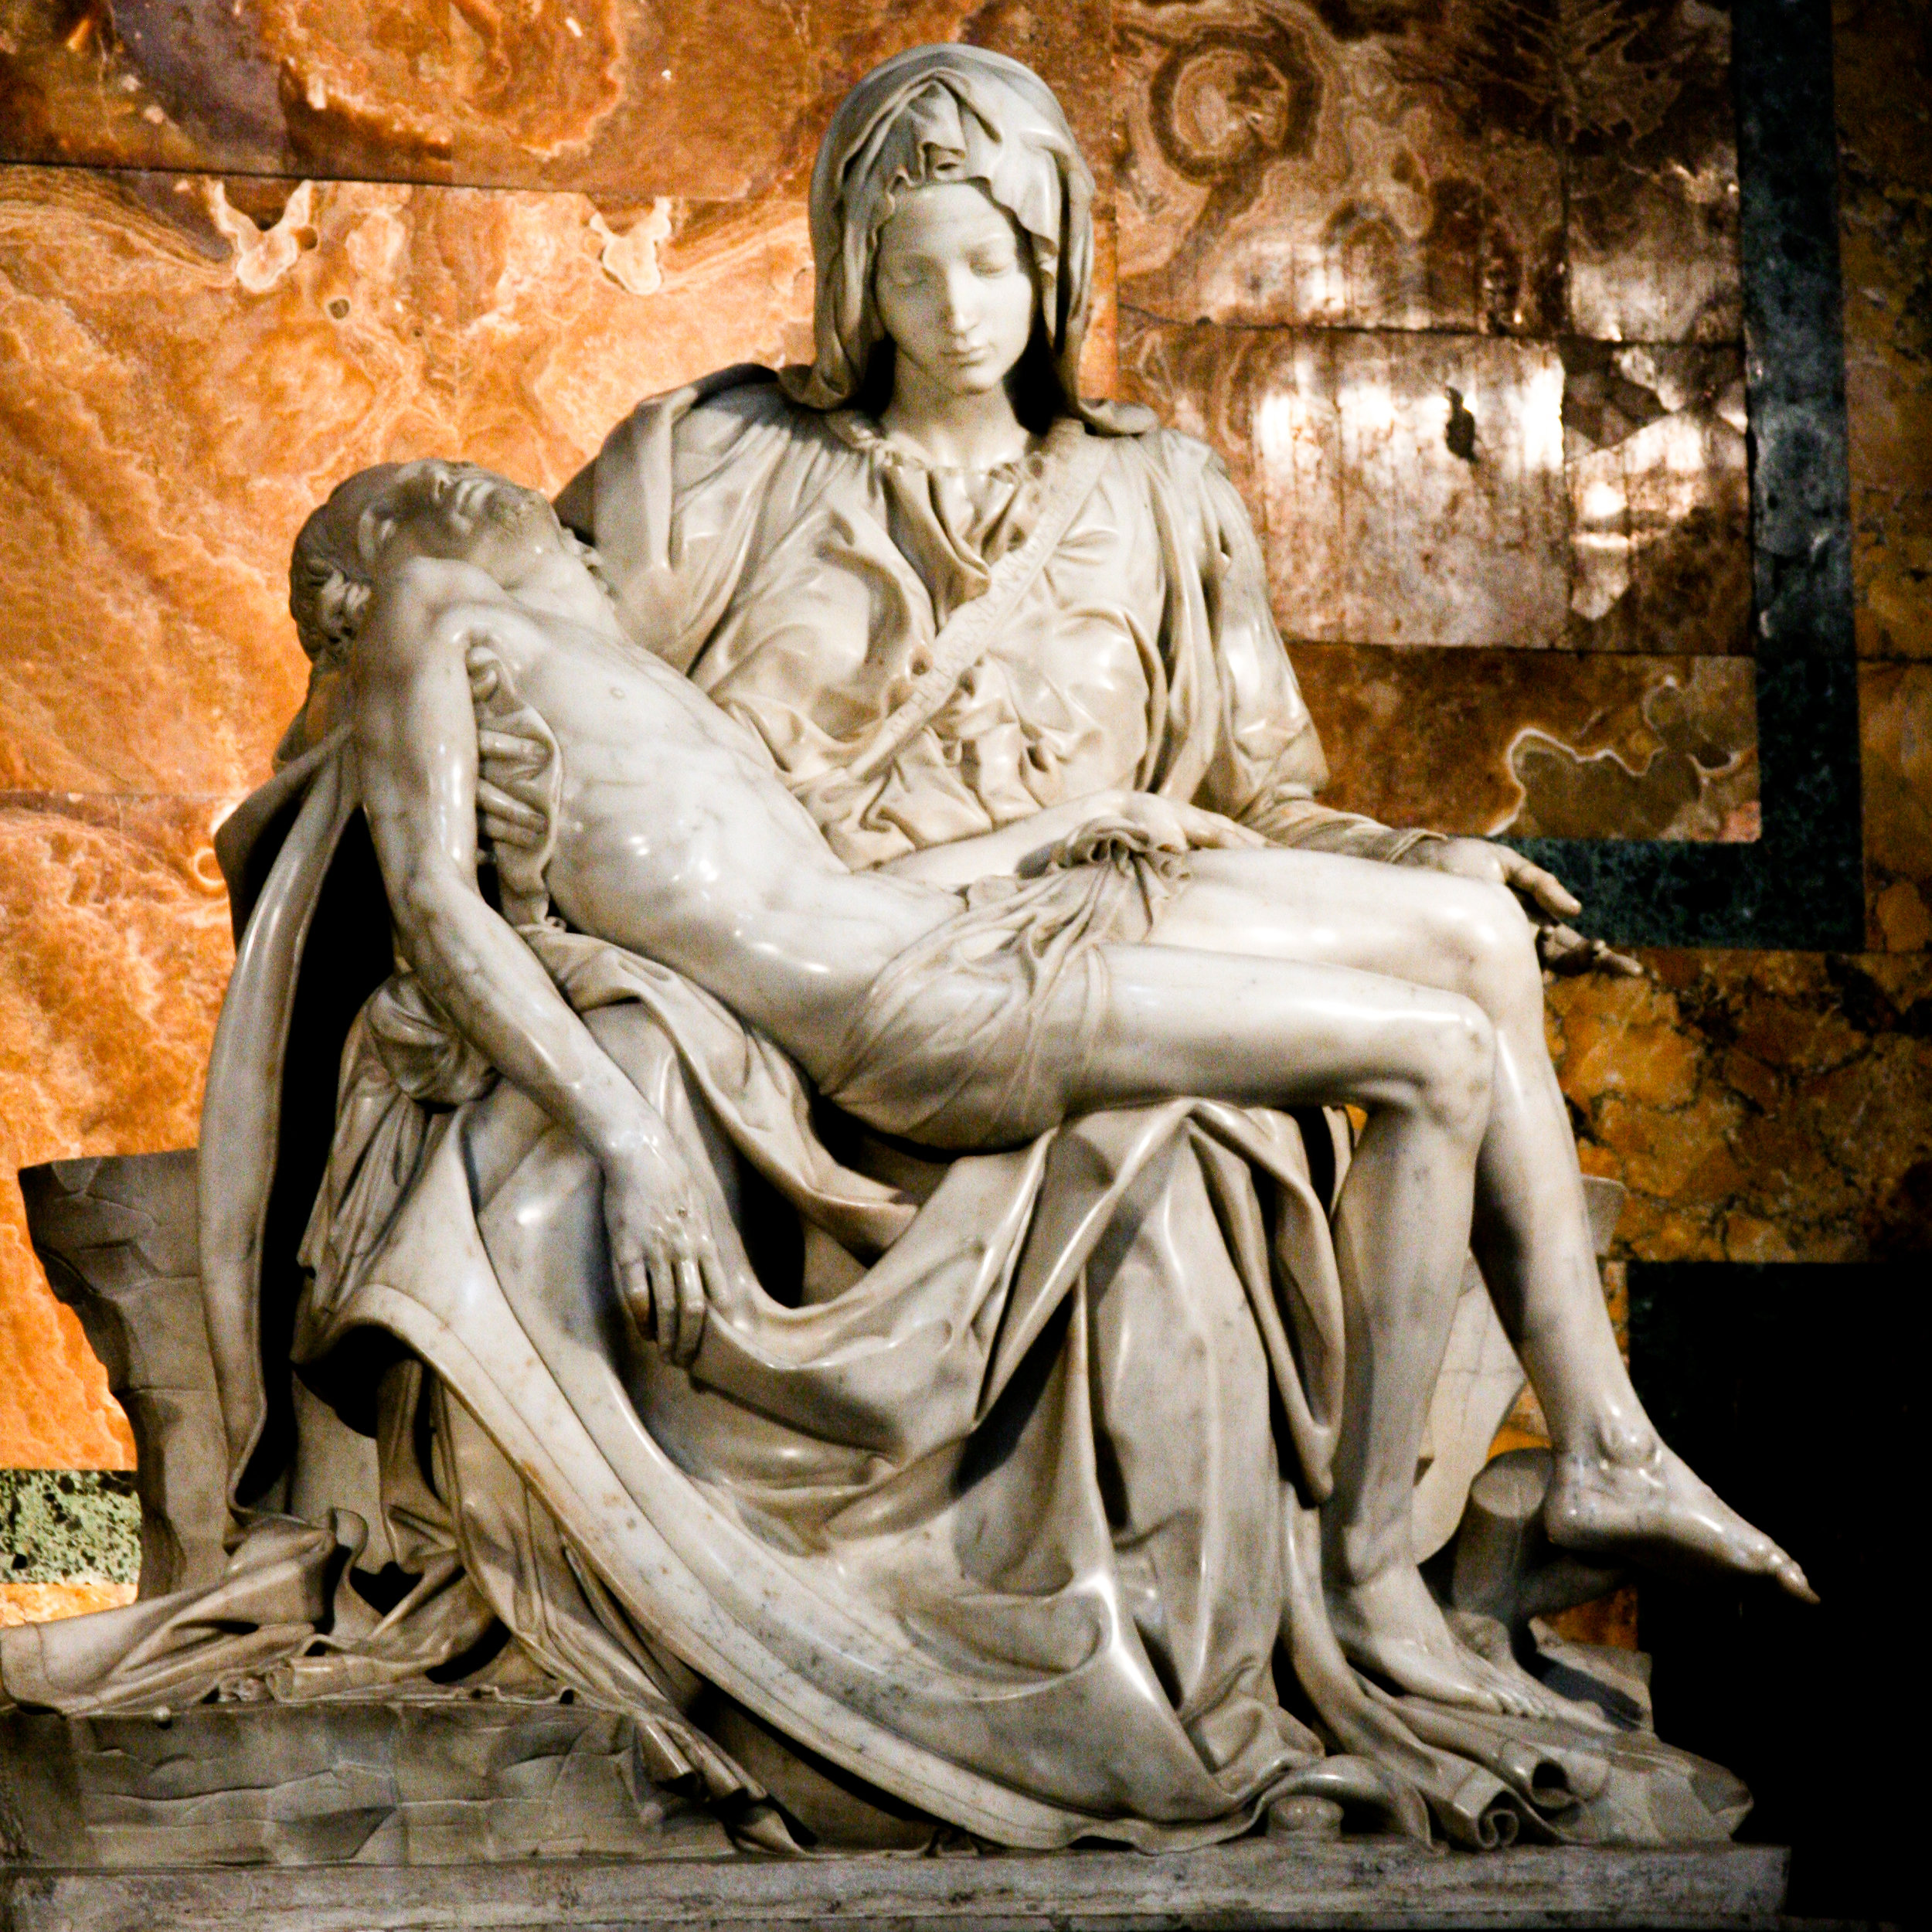 Pieta | Michelangelo Buonarroti | St. Peter's Basilica | Vatican City